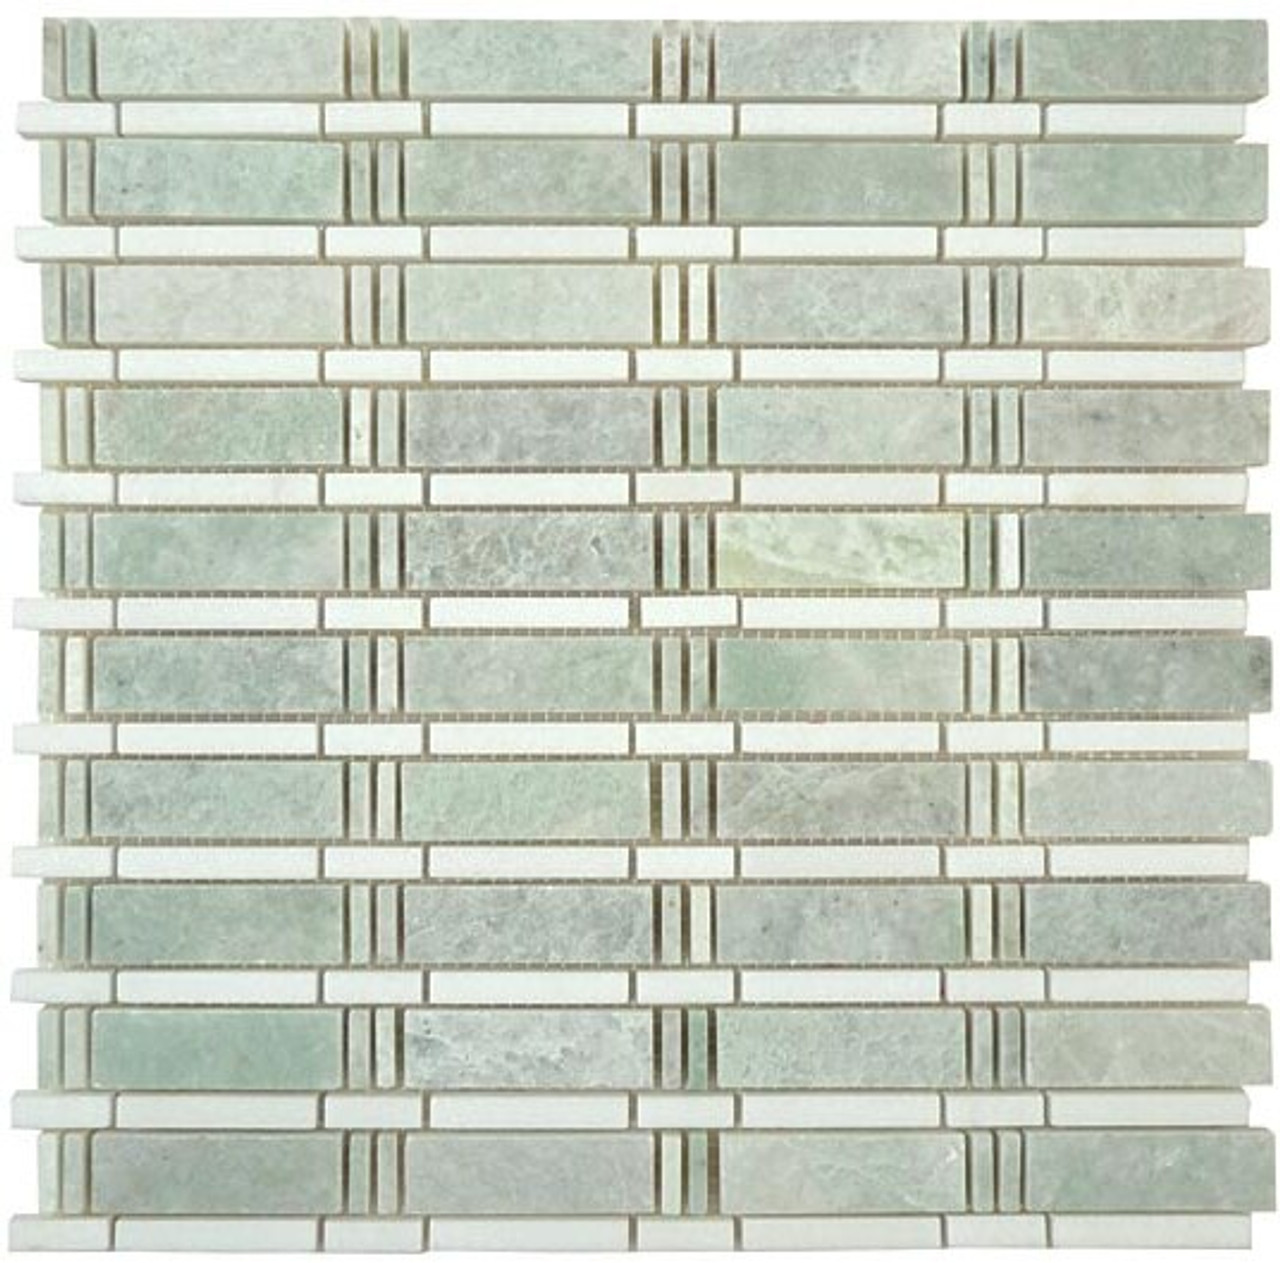 Bella Glass Tiles Skyline Series Marble Mosaic SL82